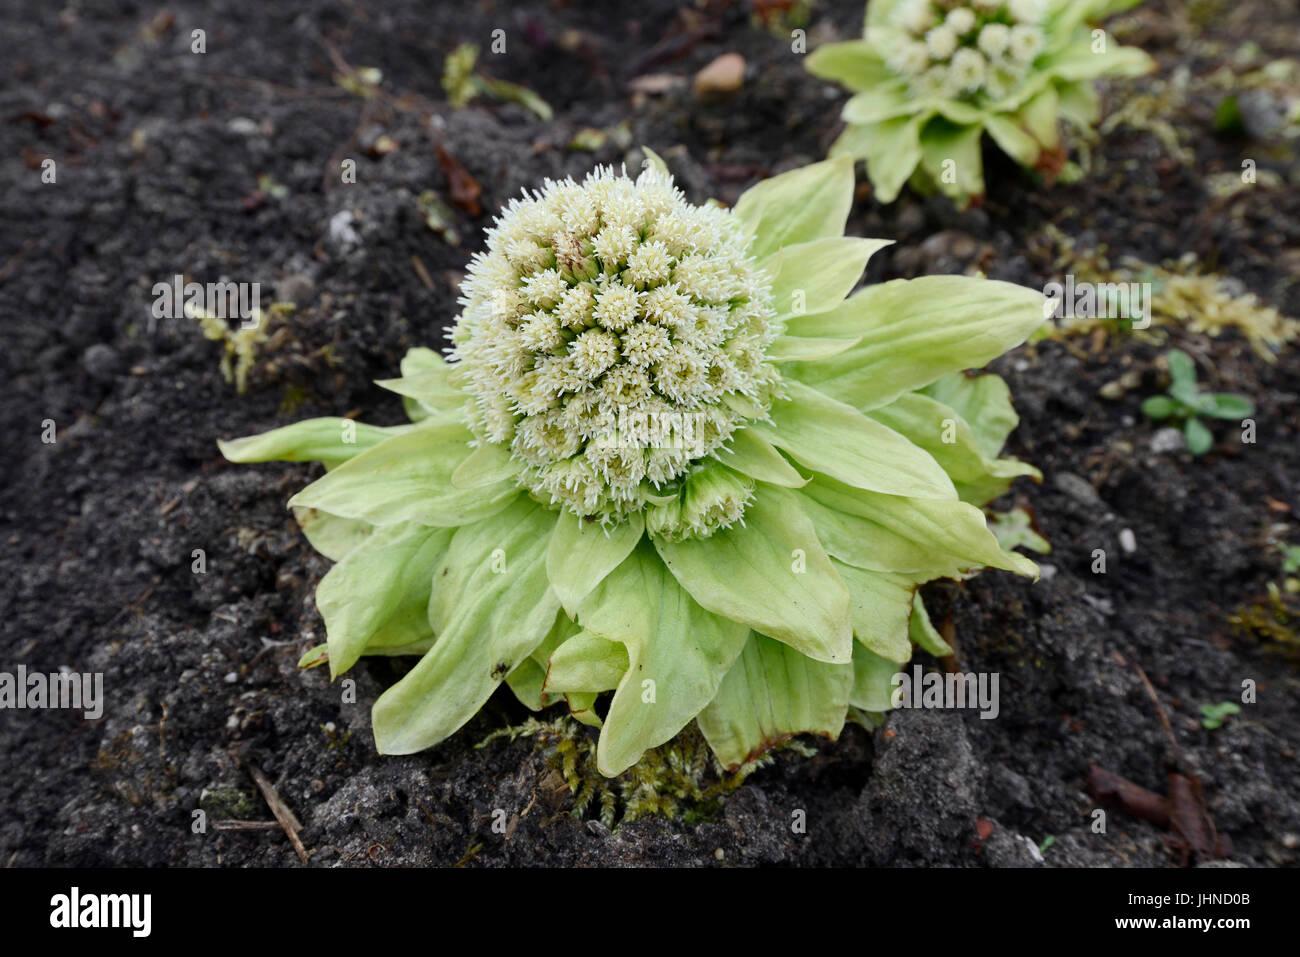 Japanese Butterbur / (Petasites japonicus) | Japanische Pestwurz oder Asiatische Pestwurz / (Petasites japonicus) - Stock Image